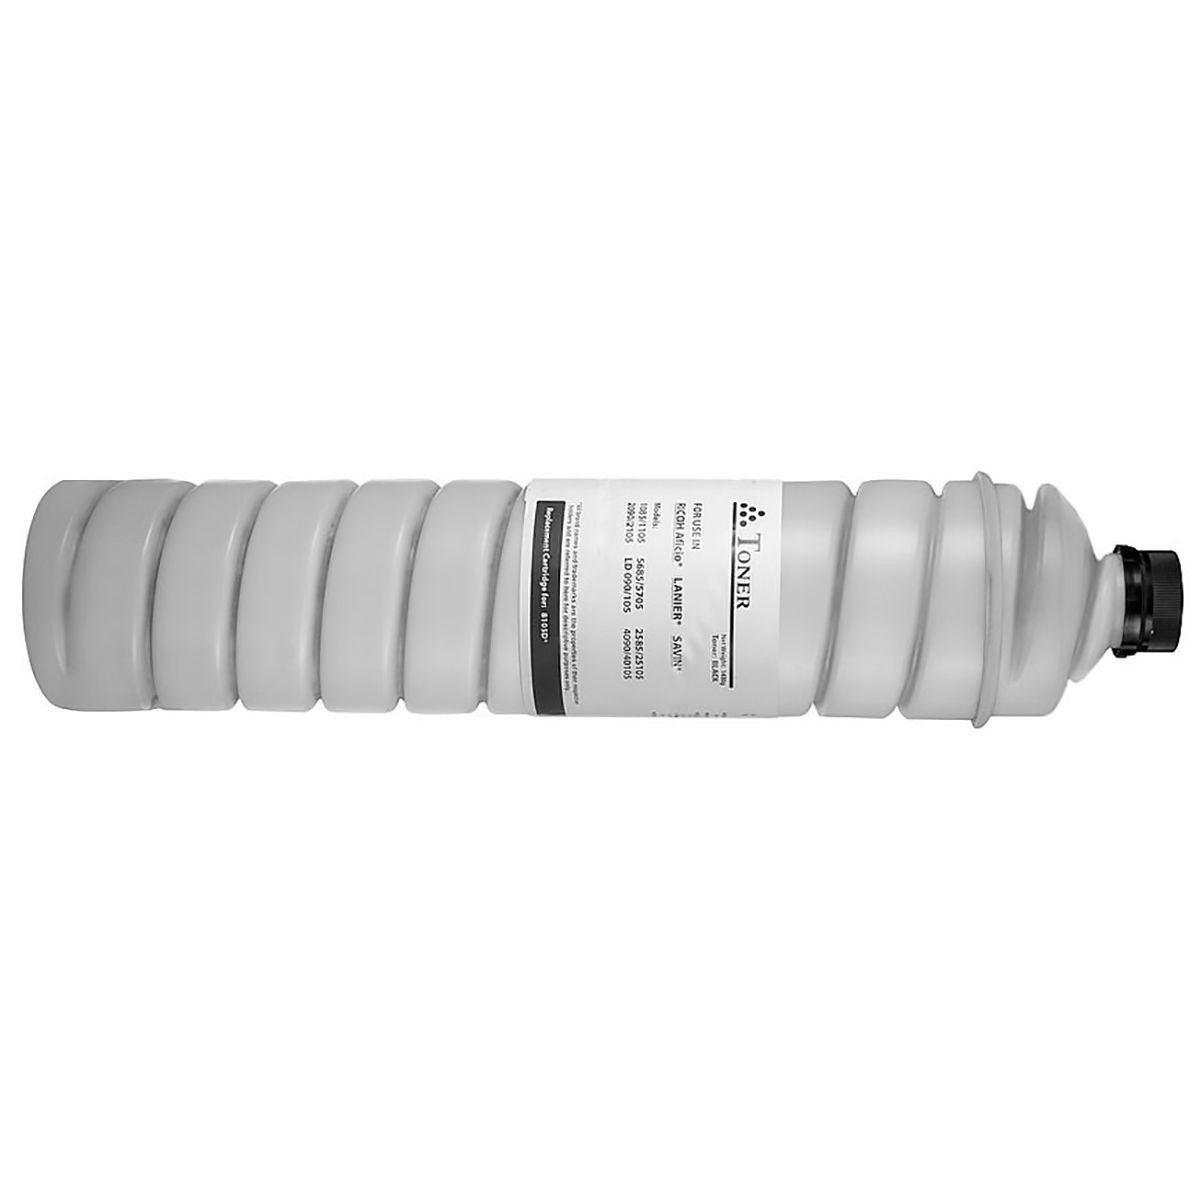 Compatível: Toner 1130D para Ricoh MP1600 MP1610l MP1800 MP1801 MP1810l MP2000 MP2000spf MP-1610ld / Preto / 9.000